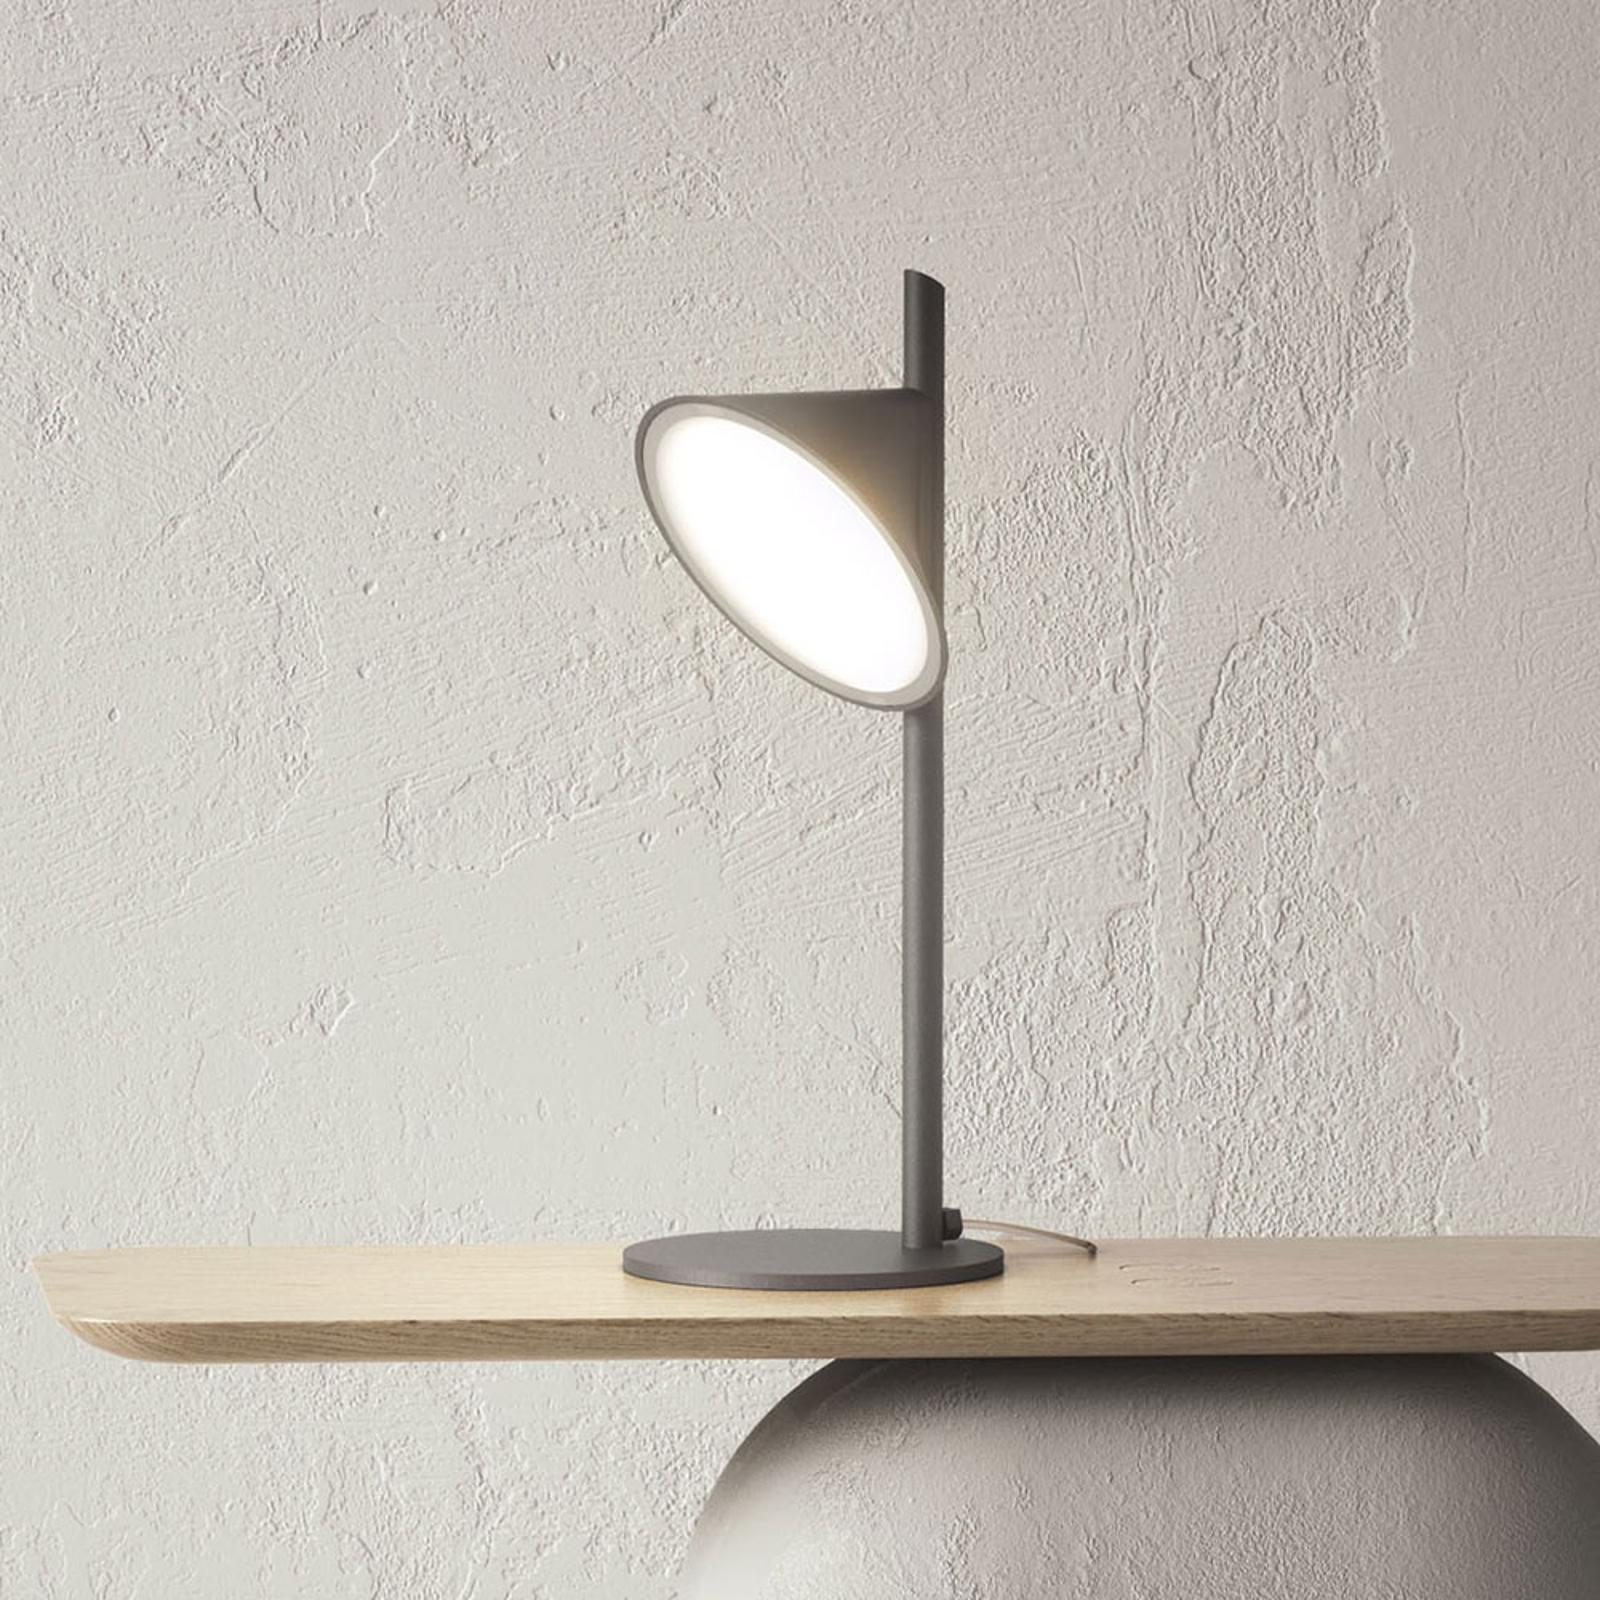 Axolight Orchid LED-Tischleuchte, dunkelgrau